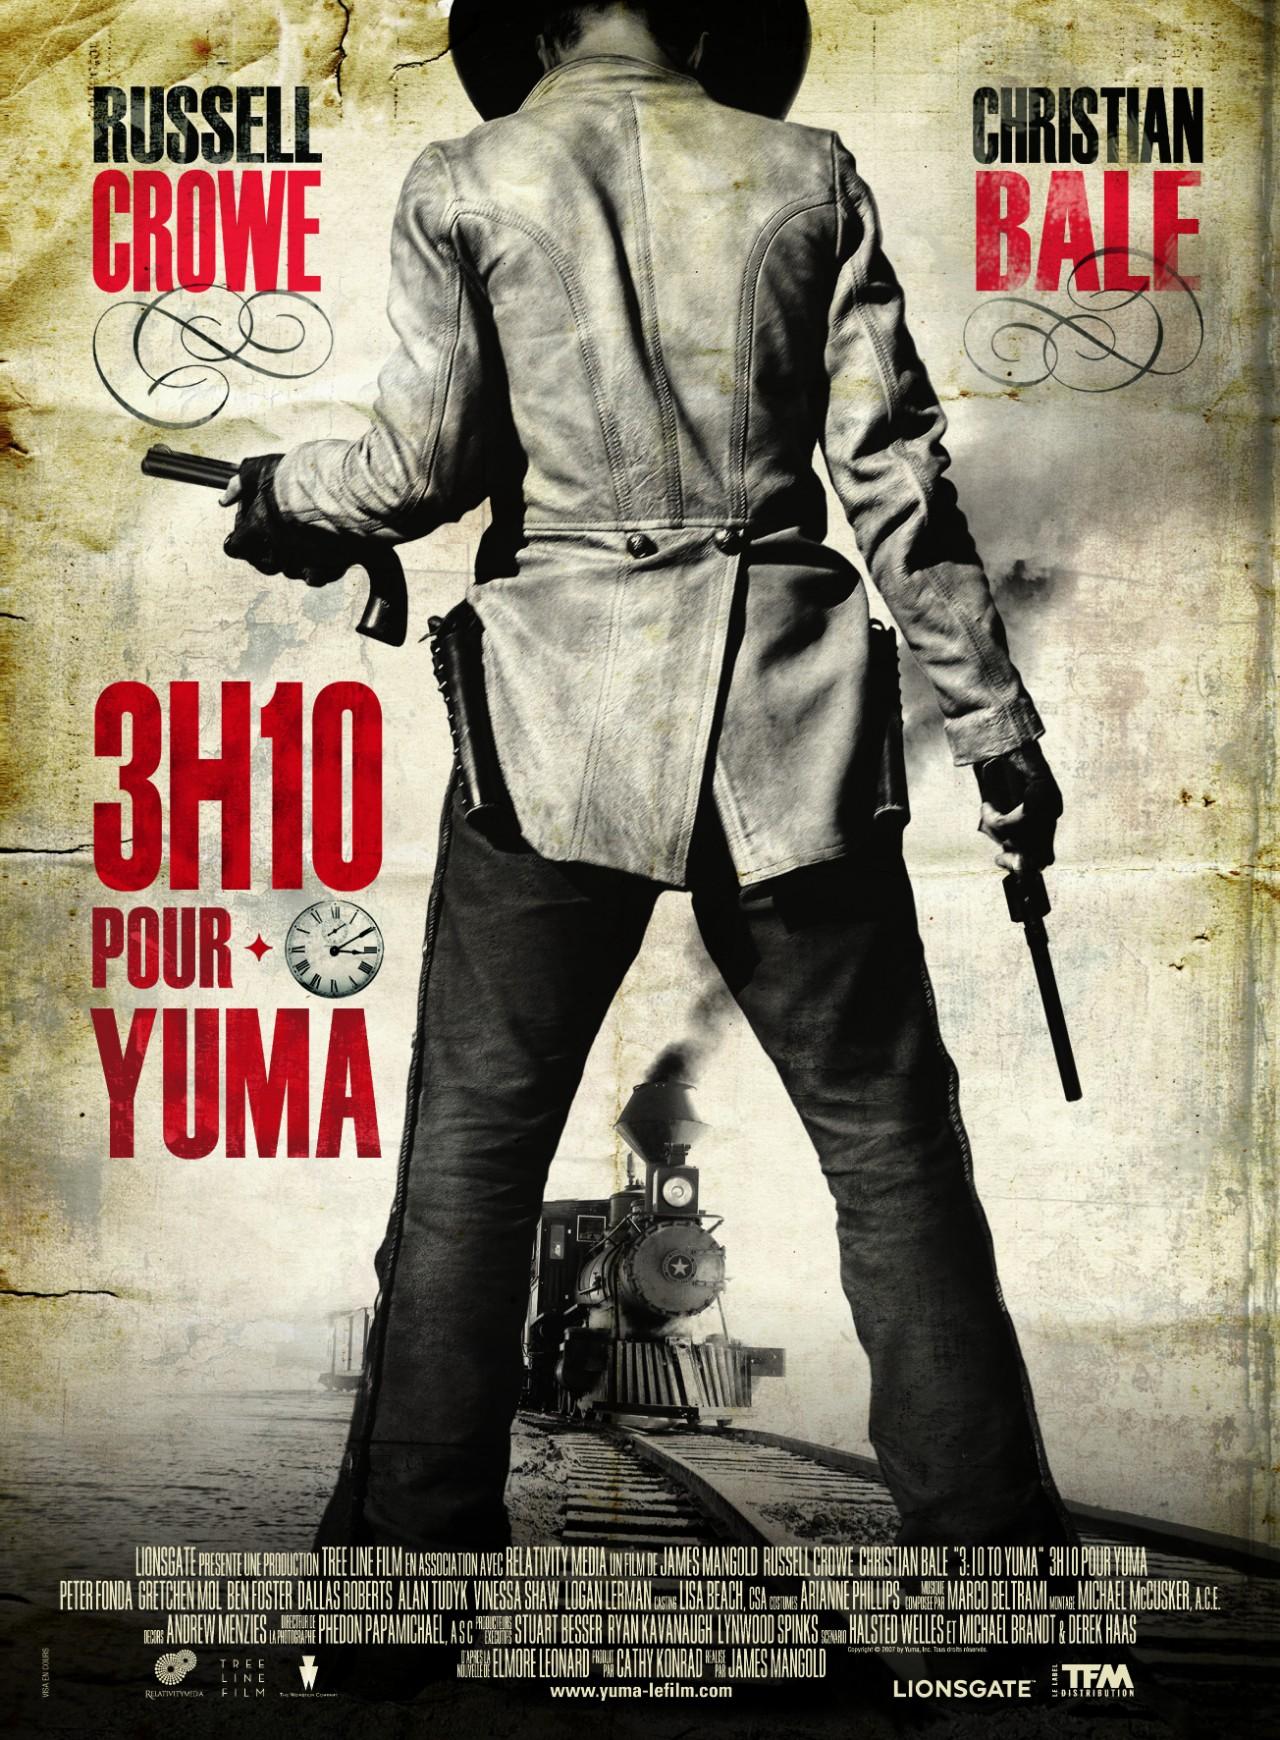 3h10 pour Yuma [DVDRiP] [FRENCH] [MULTI]